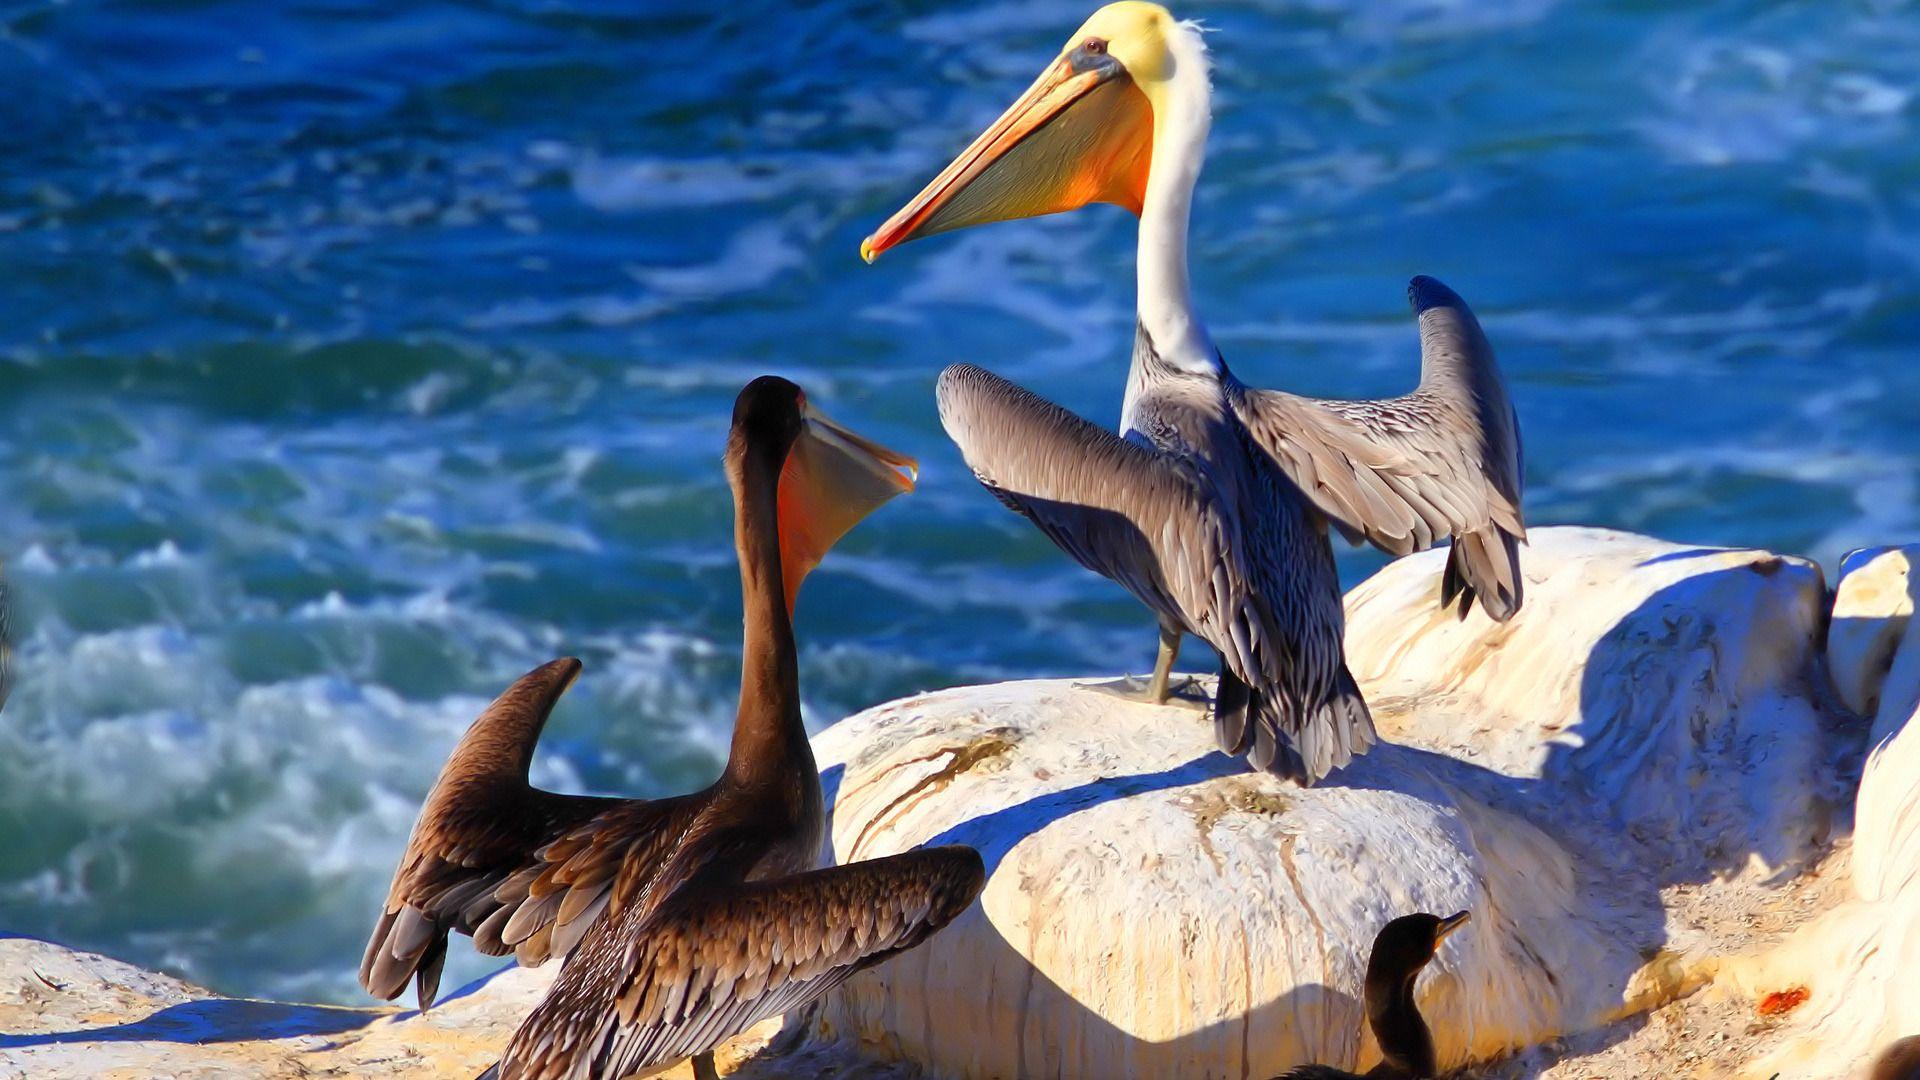 Pelican new wallpaper